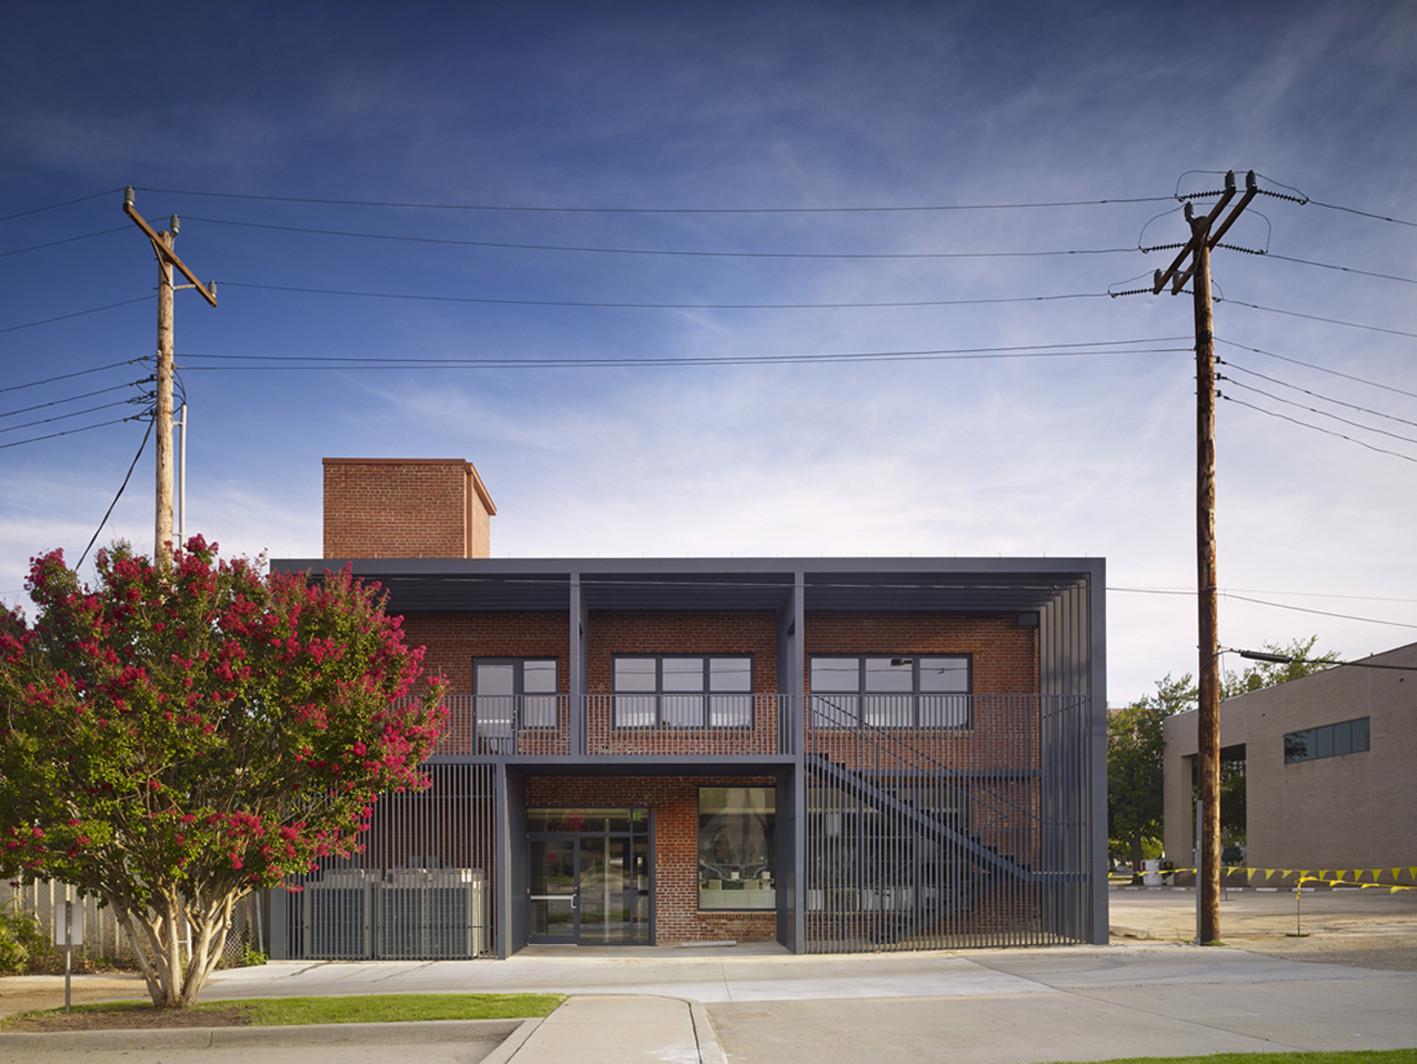 Lingo Construction Services / Elliott + Associates Architects, © Scott McDonald - Hedrich Blessing